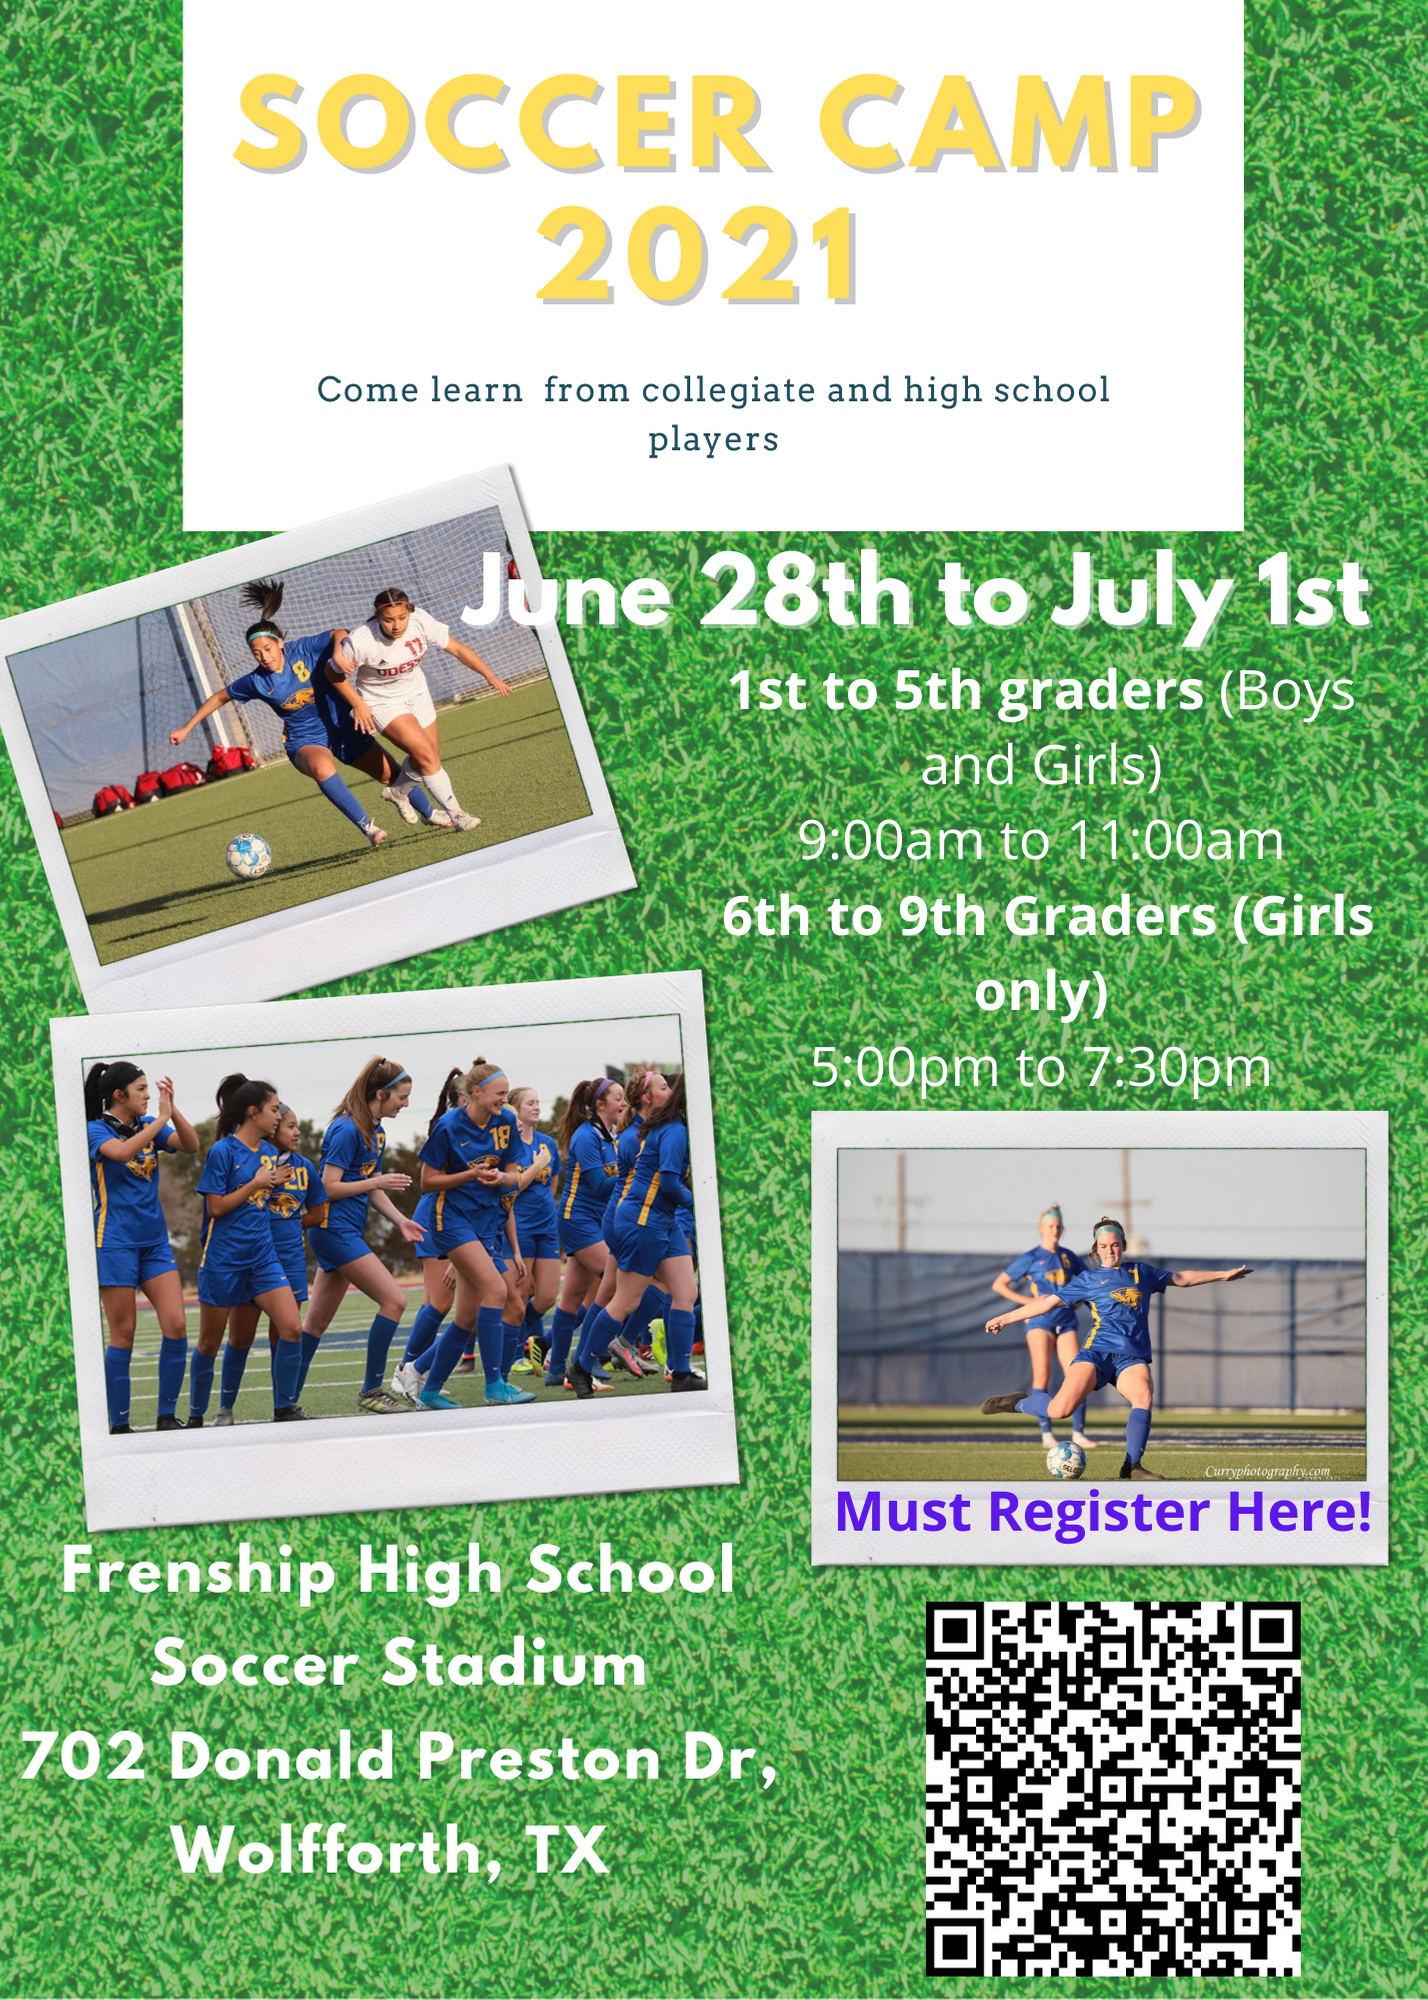 Summer Camp 2021 flyer